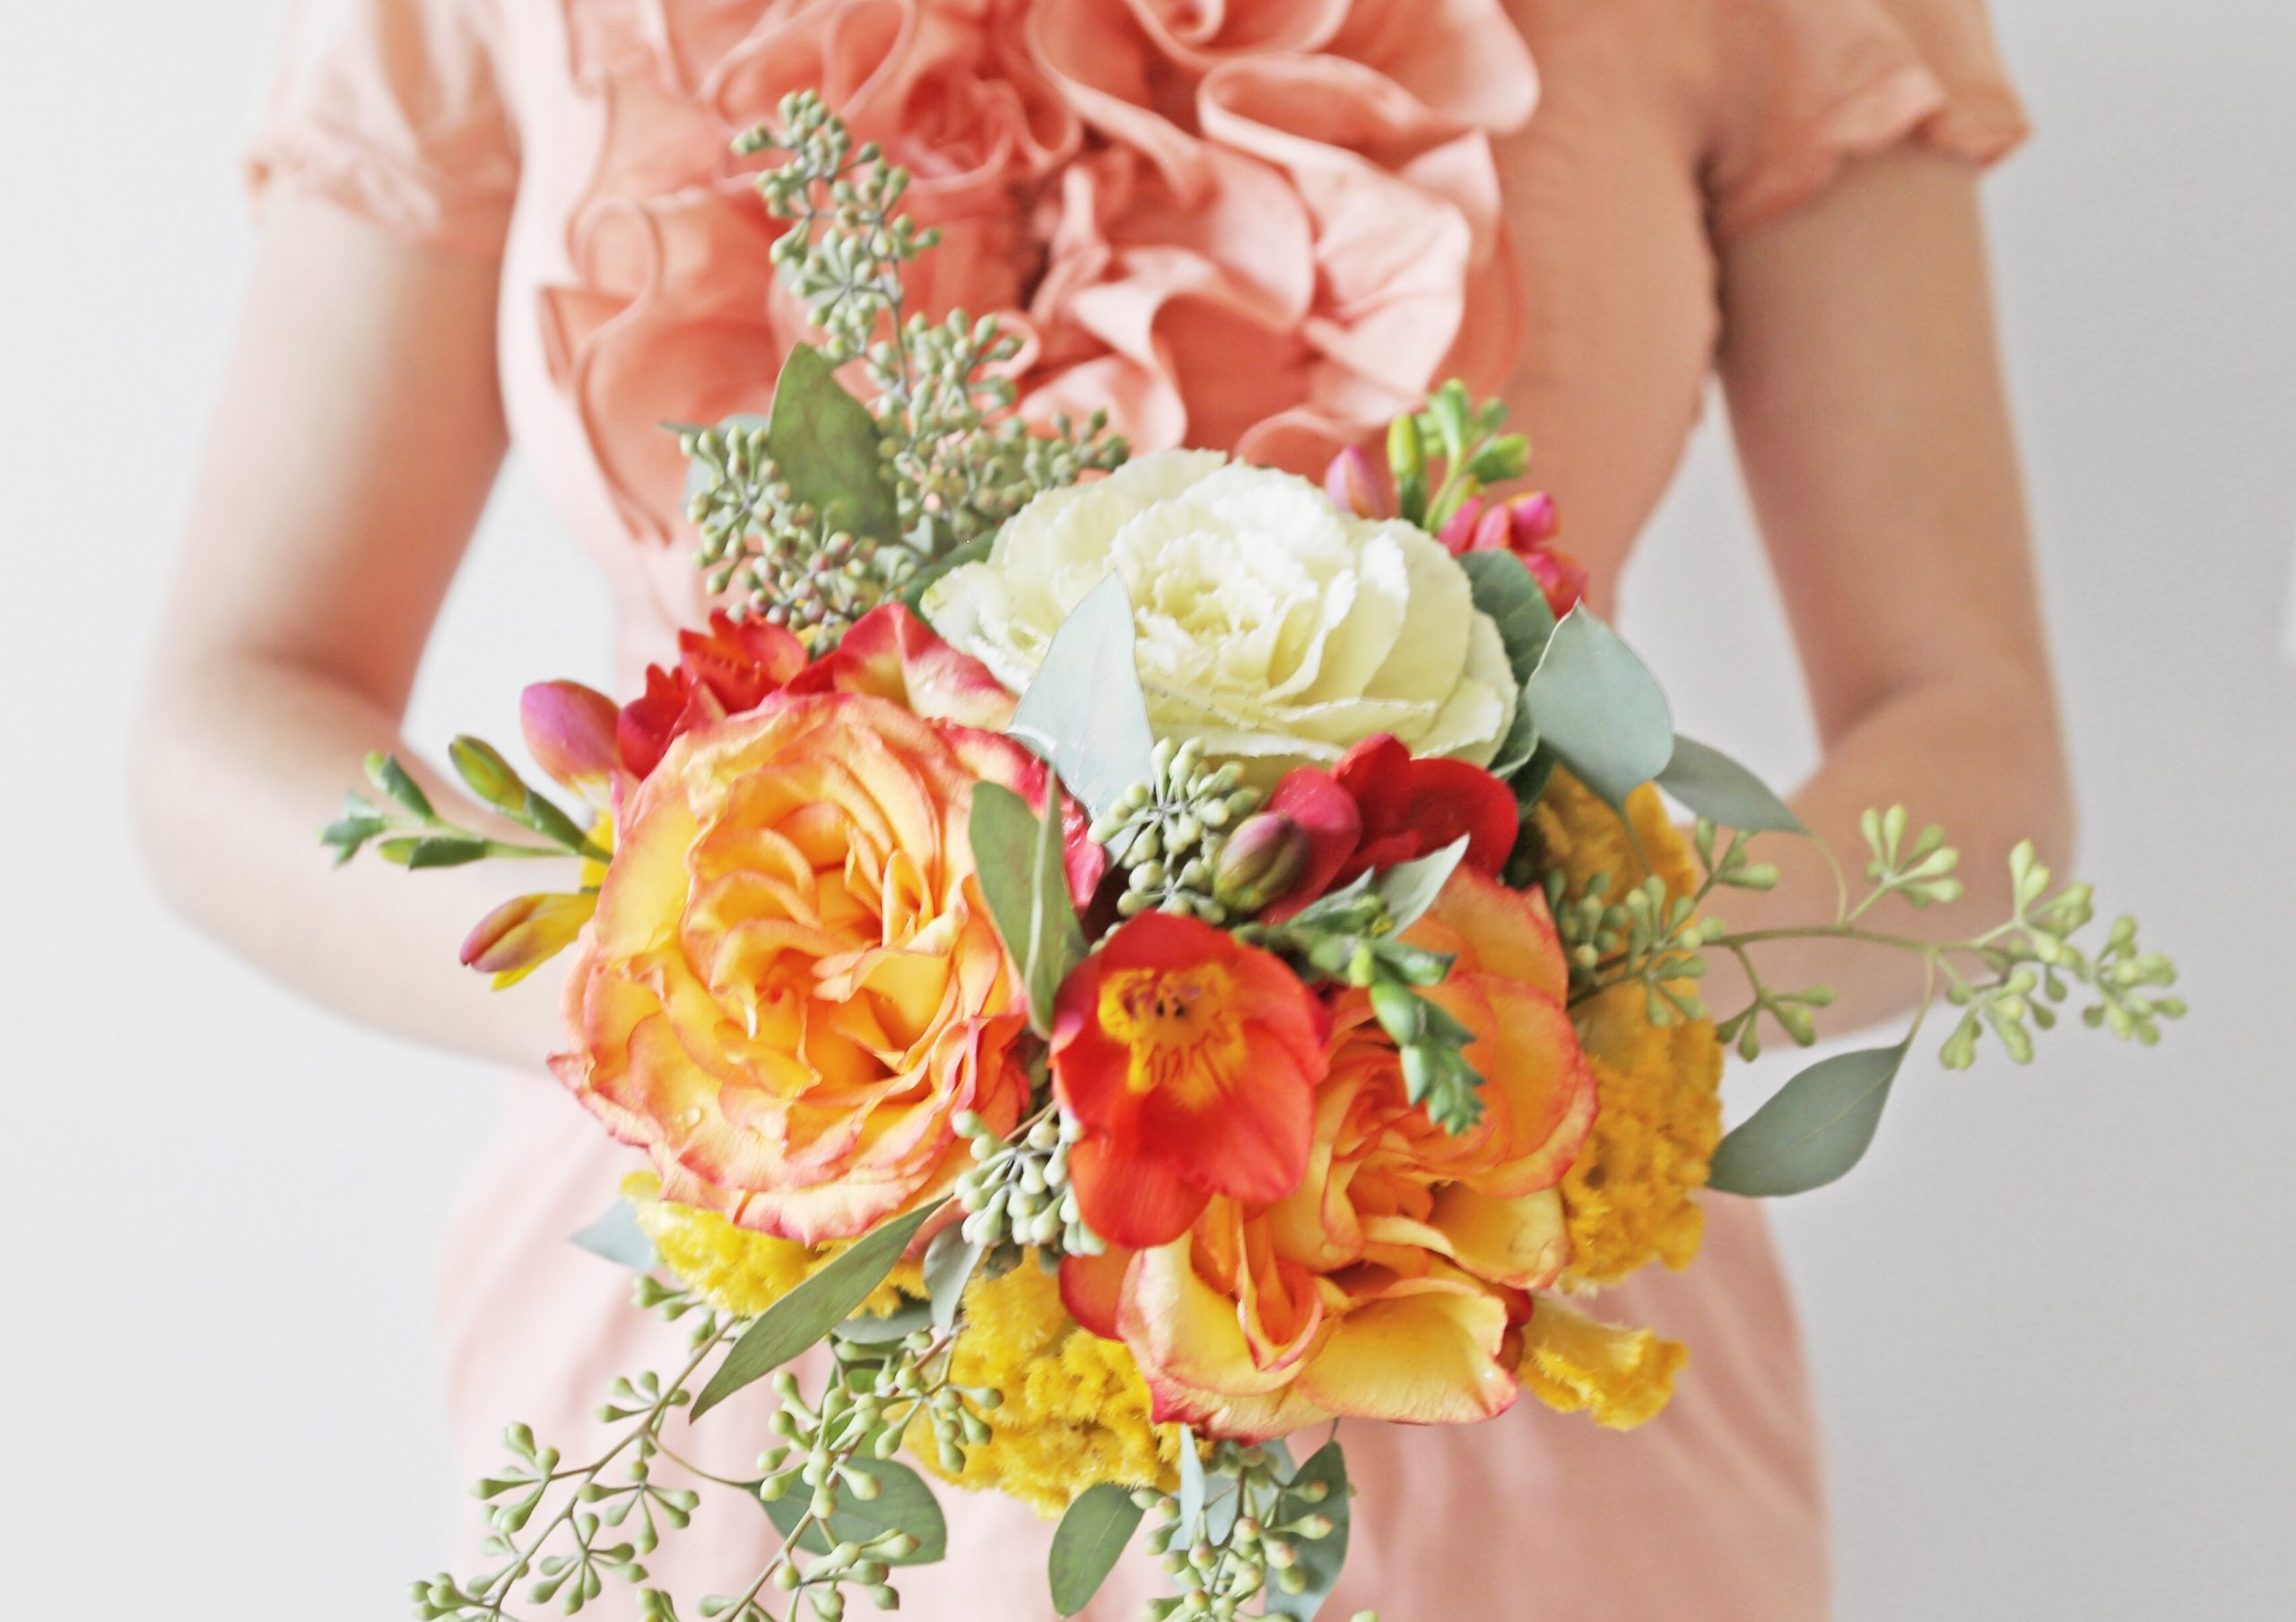 Quanti bouquet unici dal fiorista online!